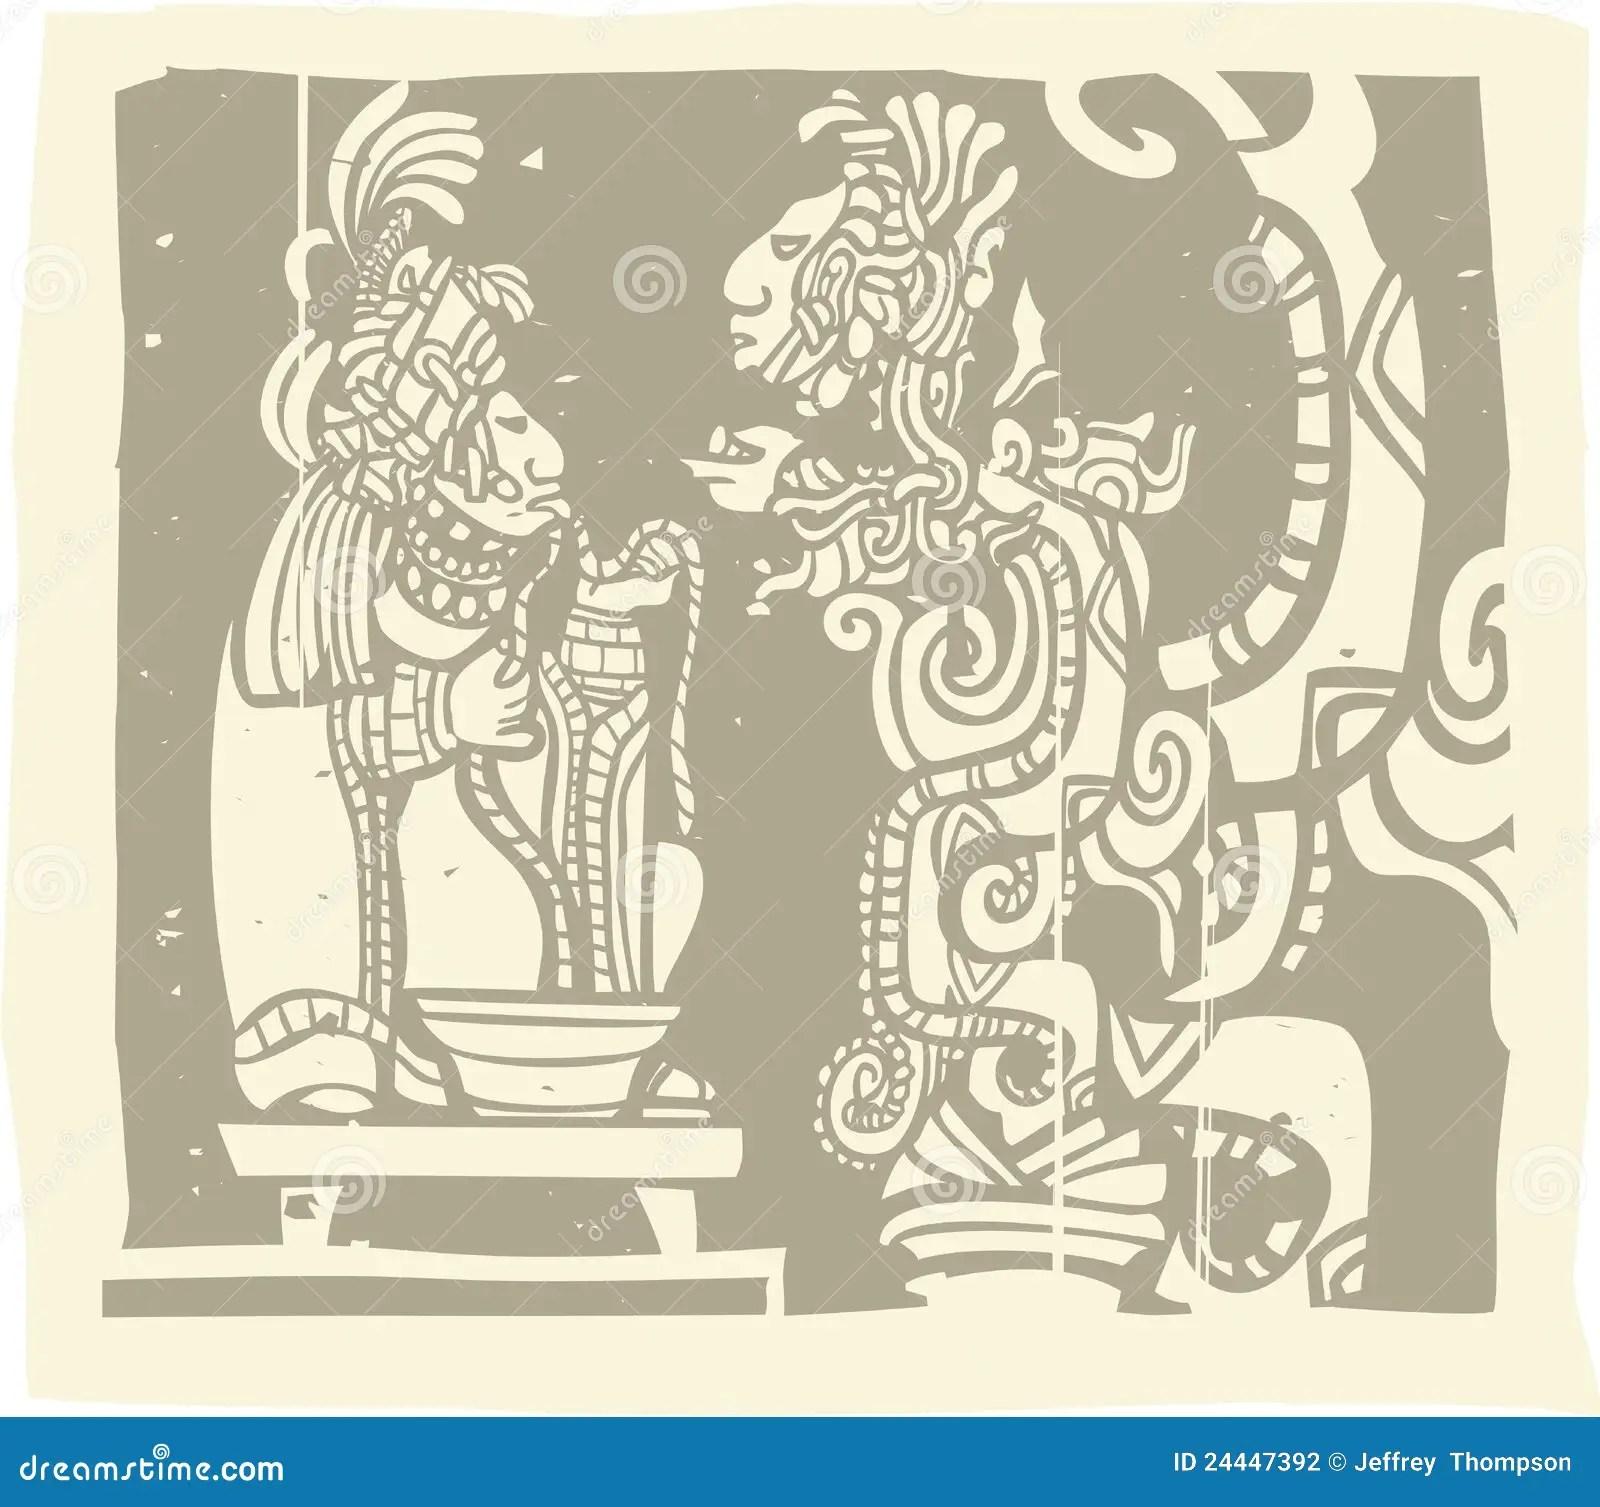 hight resolution of maya priest vision